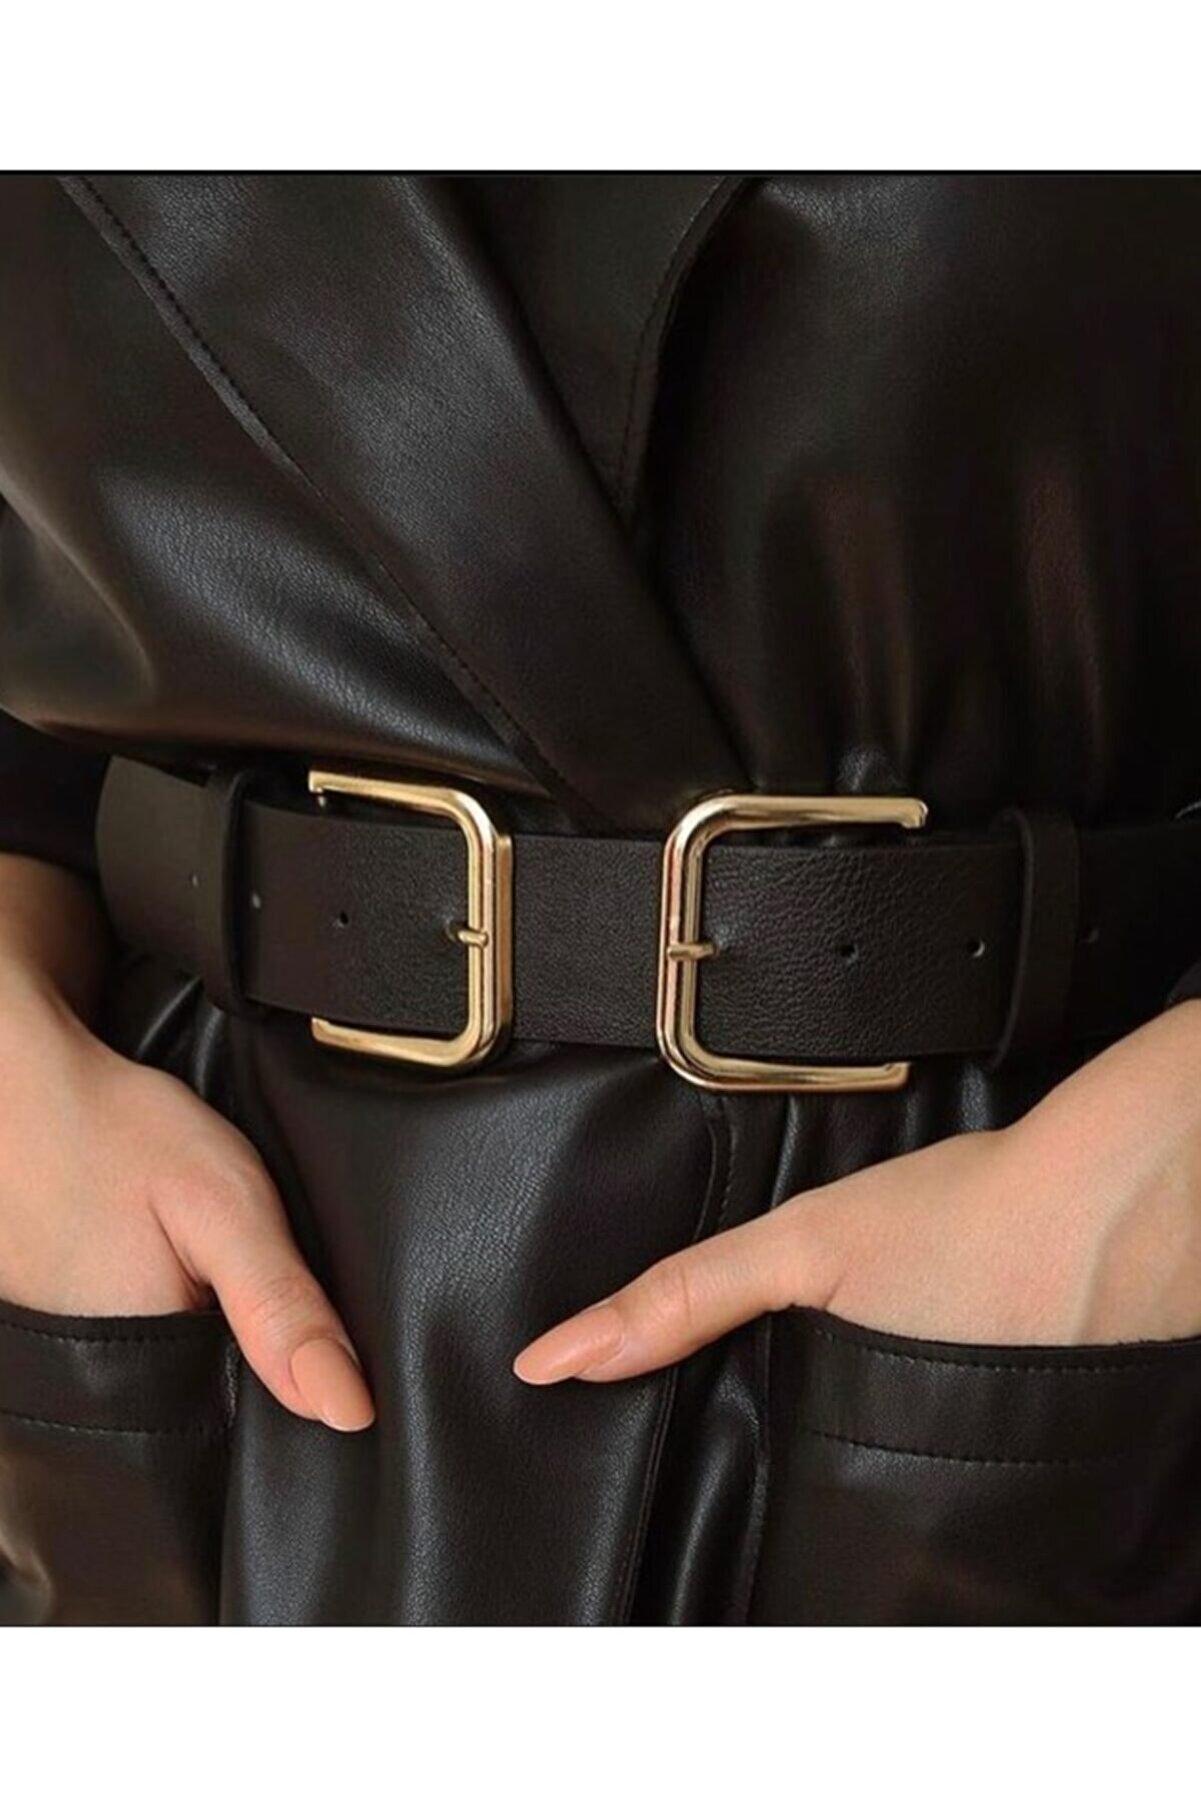 BellaVino Kadın Siyah Çift Tokalı Kemer R5099m